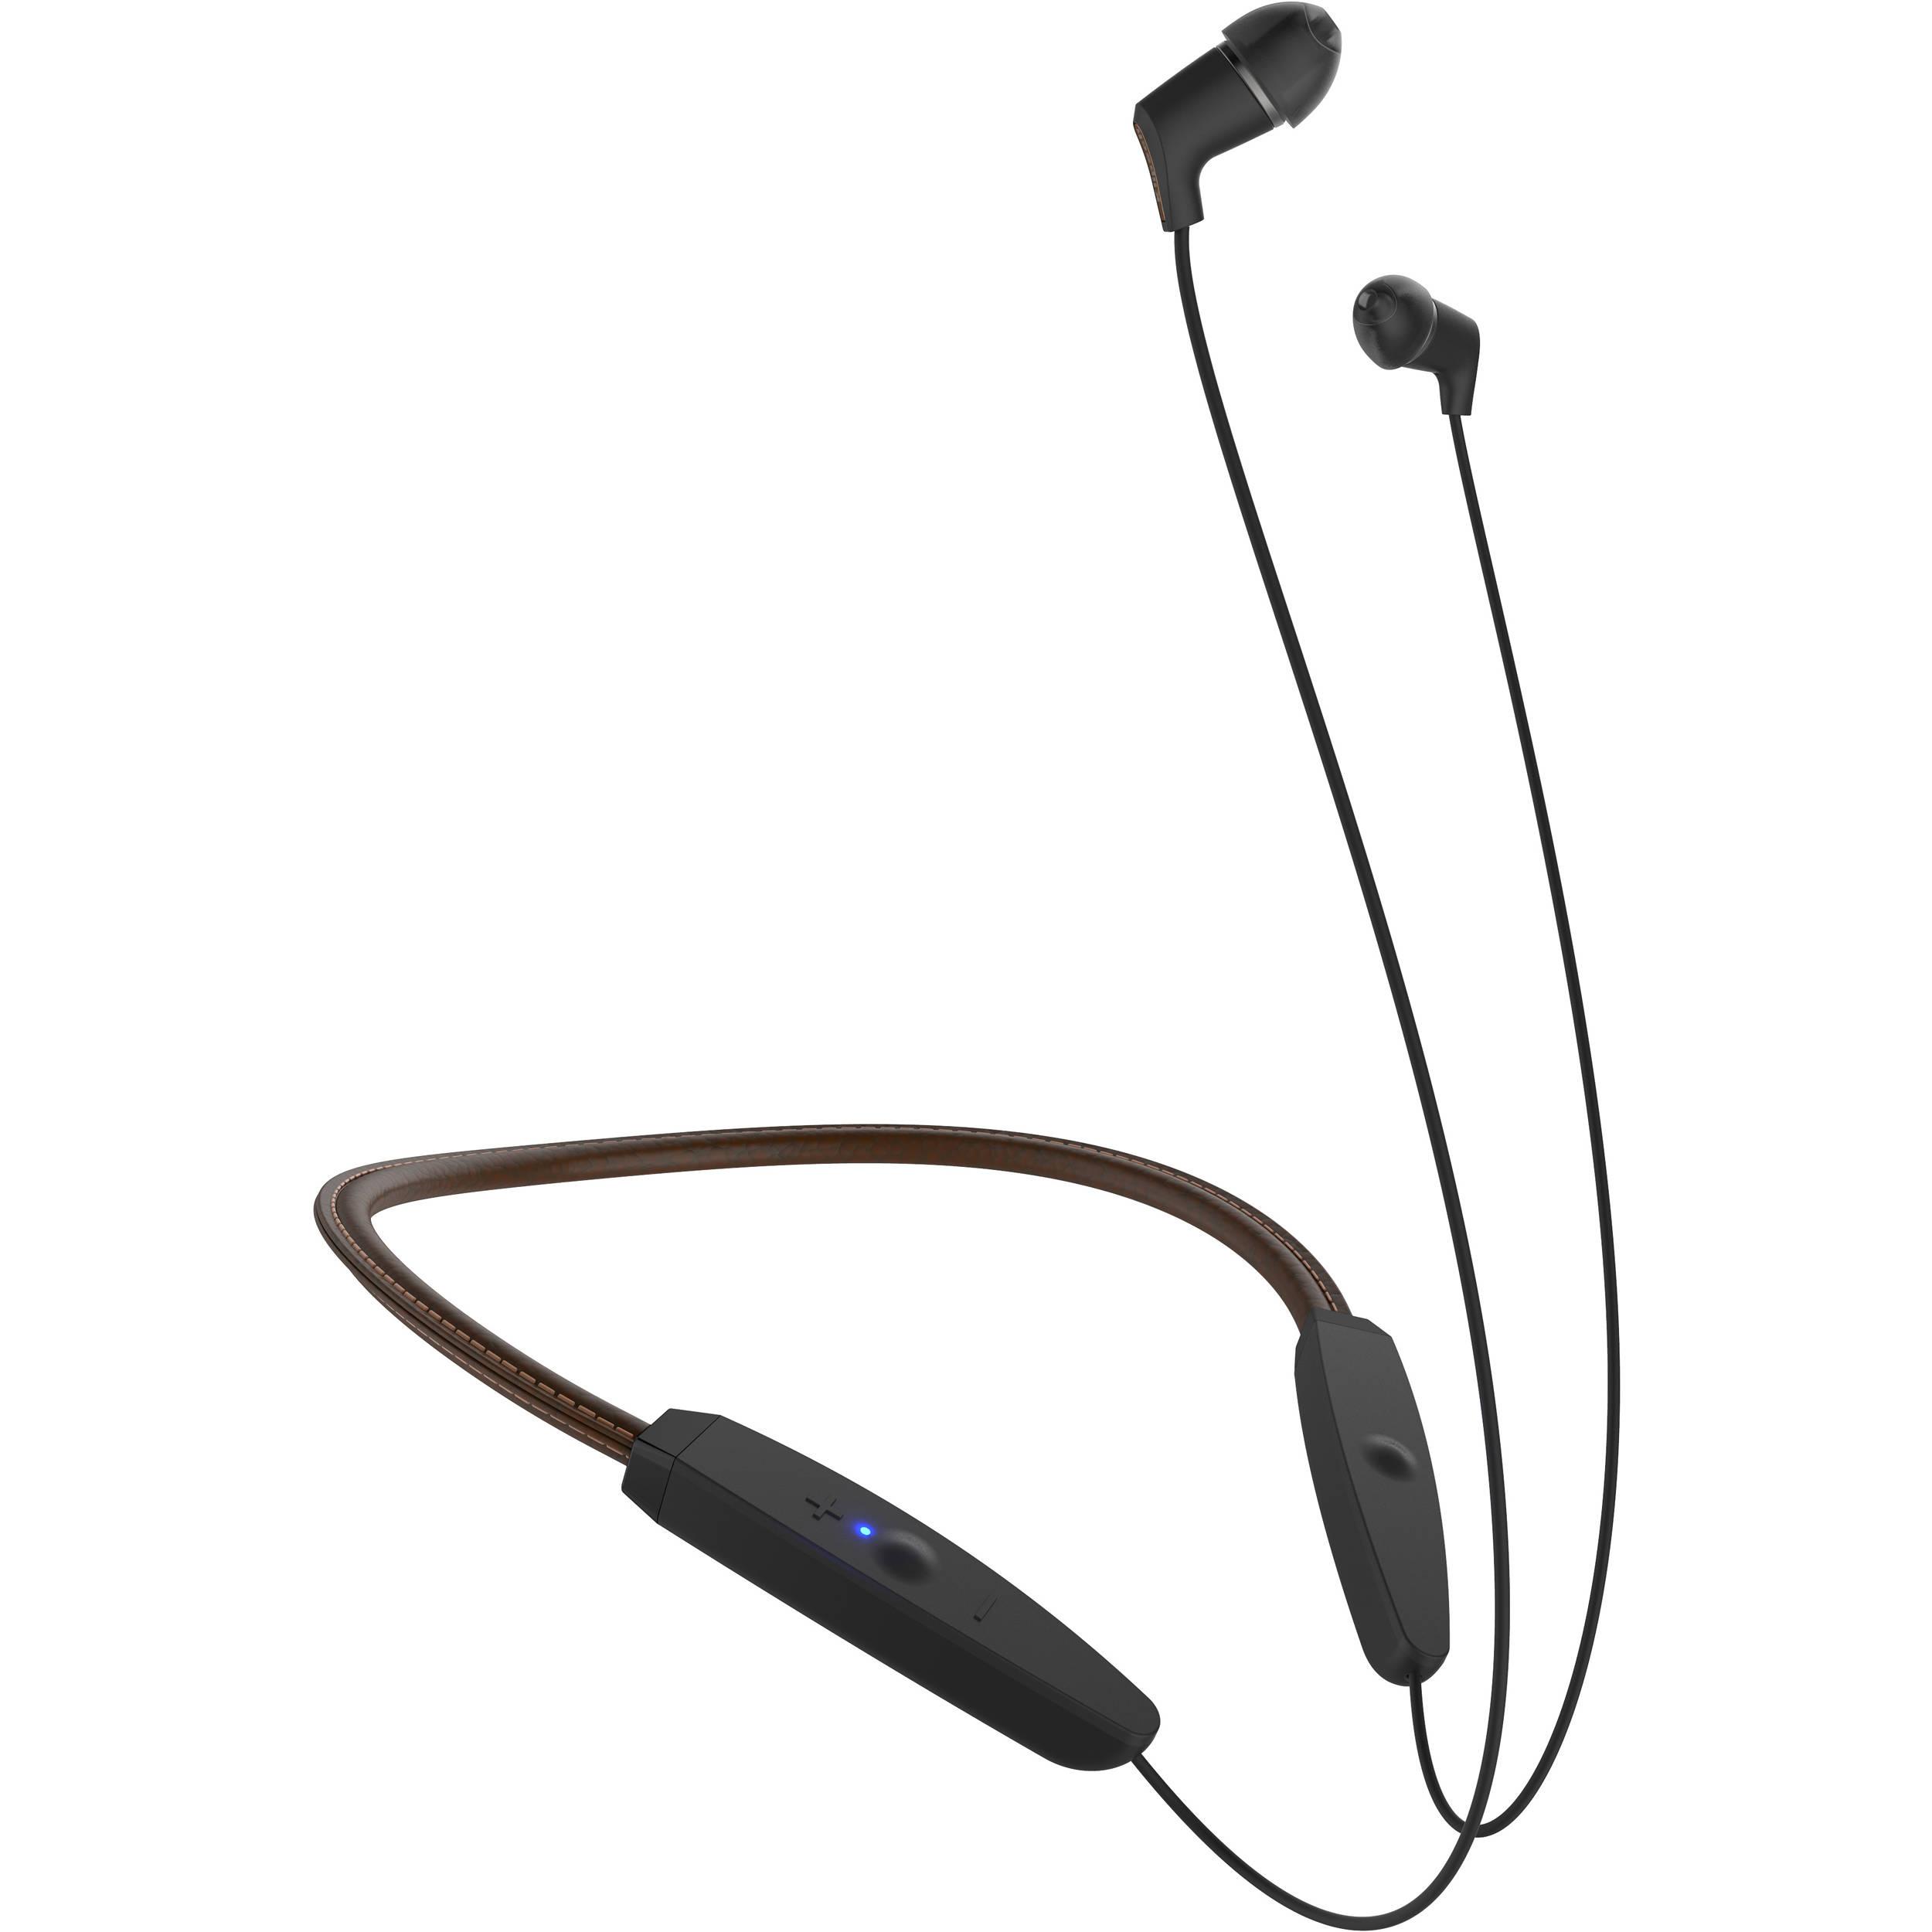 c8cc566247b Klipsch R5 Neckband Wireless In-Ear Headphones (Brown) 1064628